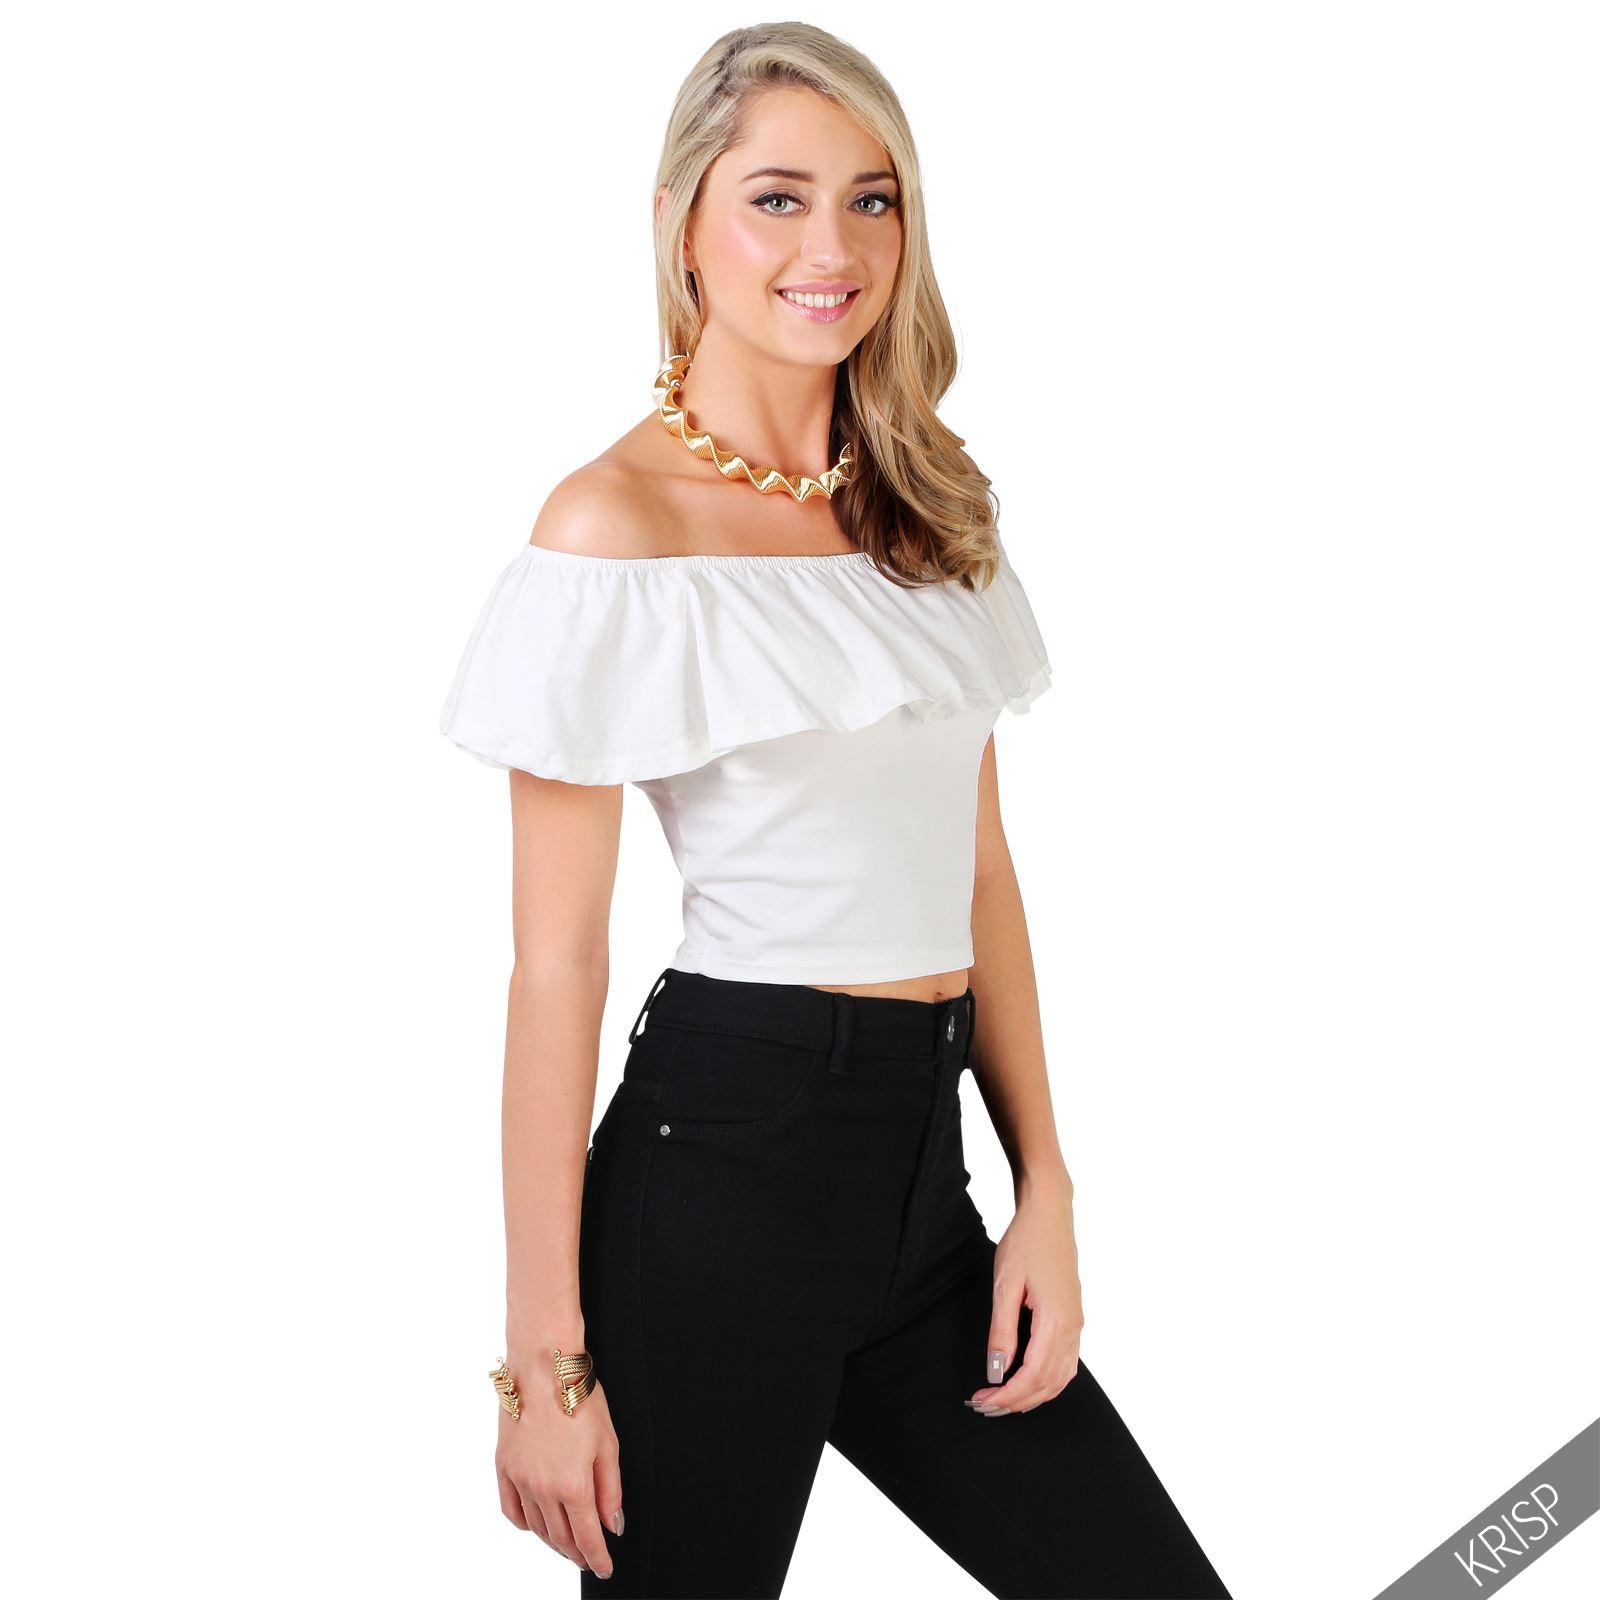 damen kurzes bandeau carmen top schulterfrei volant bluse stretchtop shirt ebay. Black Bedroom Furniture Sets. Home Design Ideas